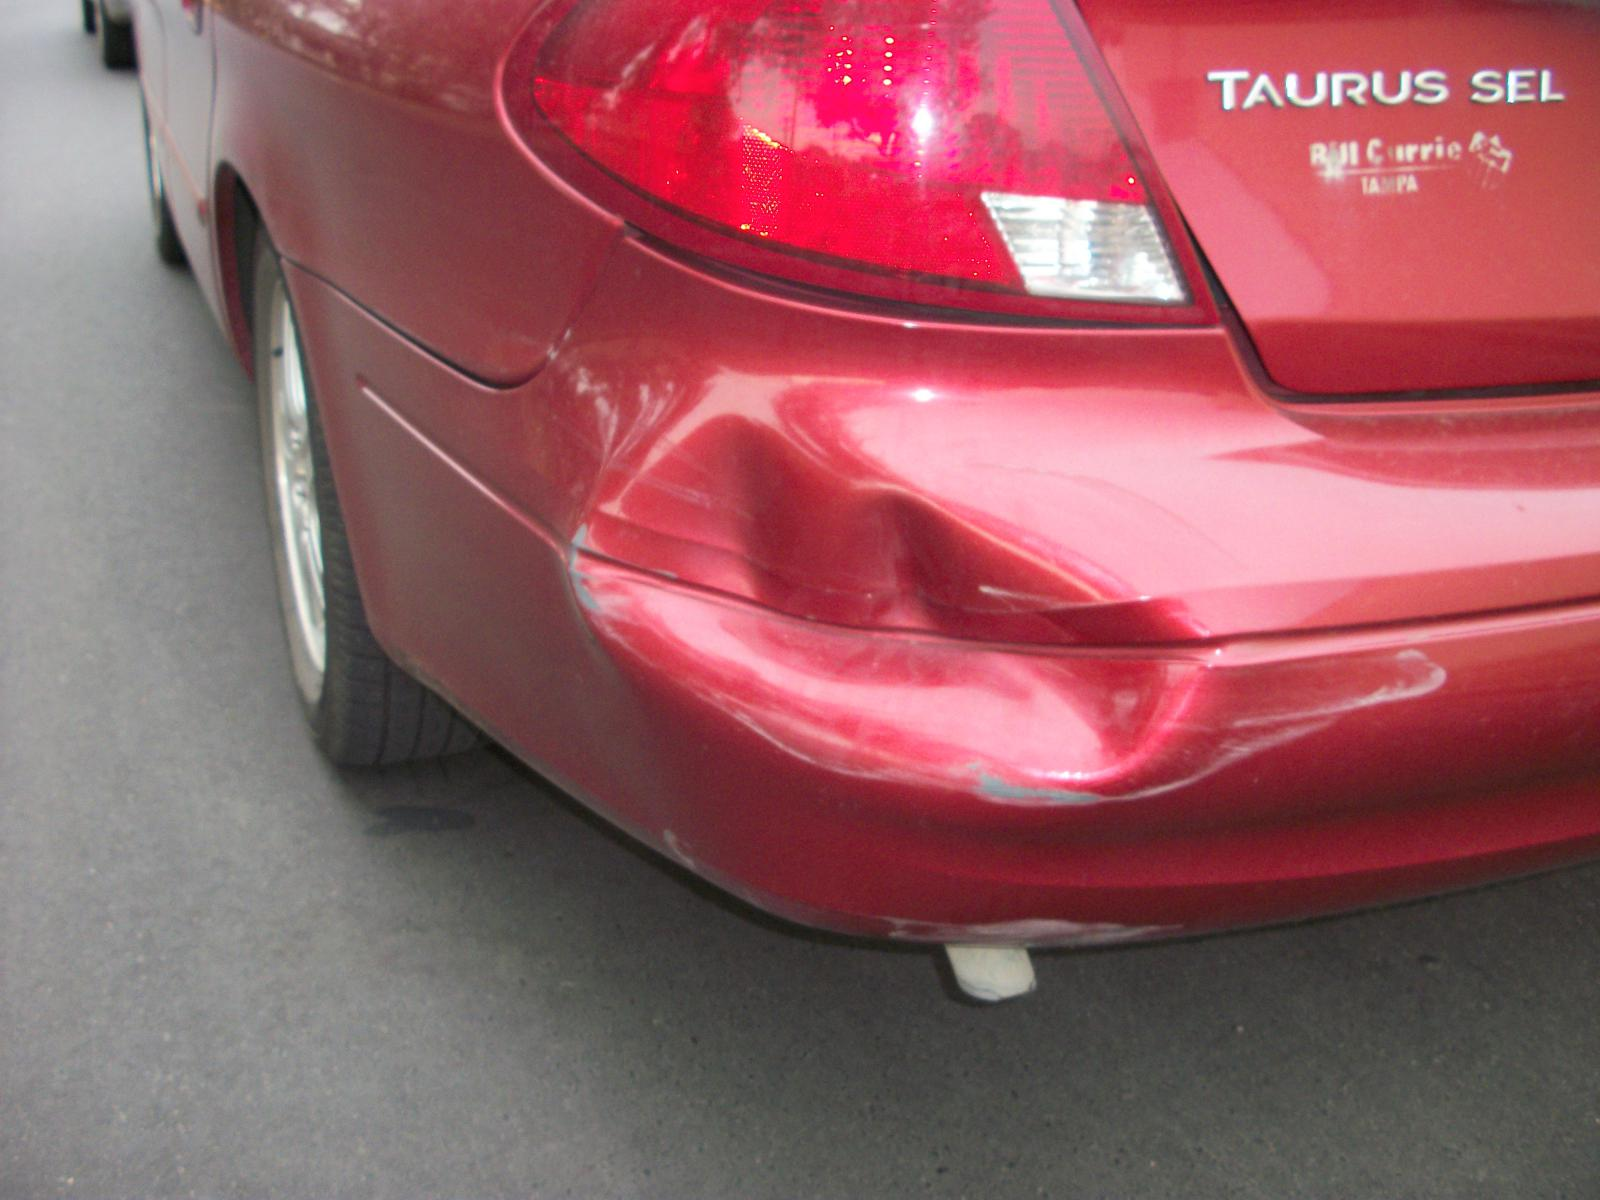 Massive rear bumper dent 106_0836 jpg